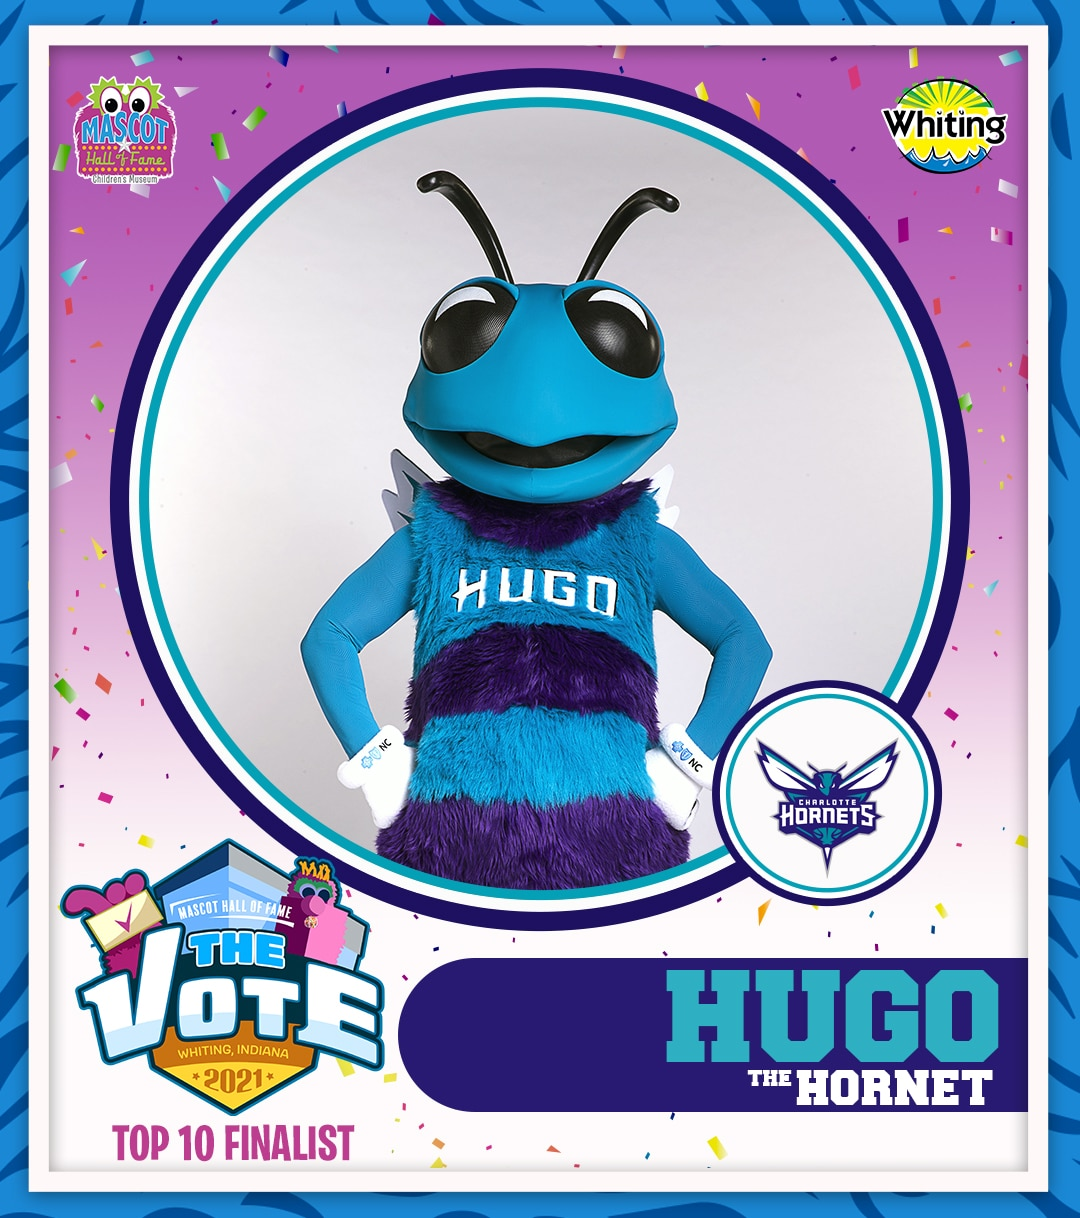 Hugo the Hornet photo